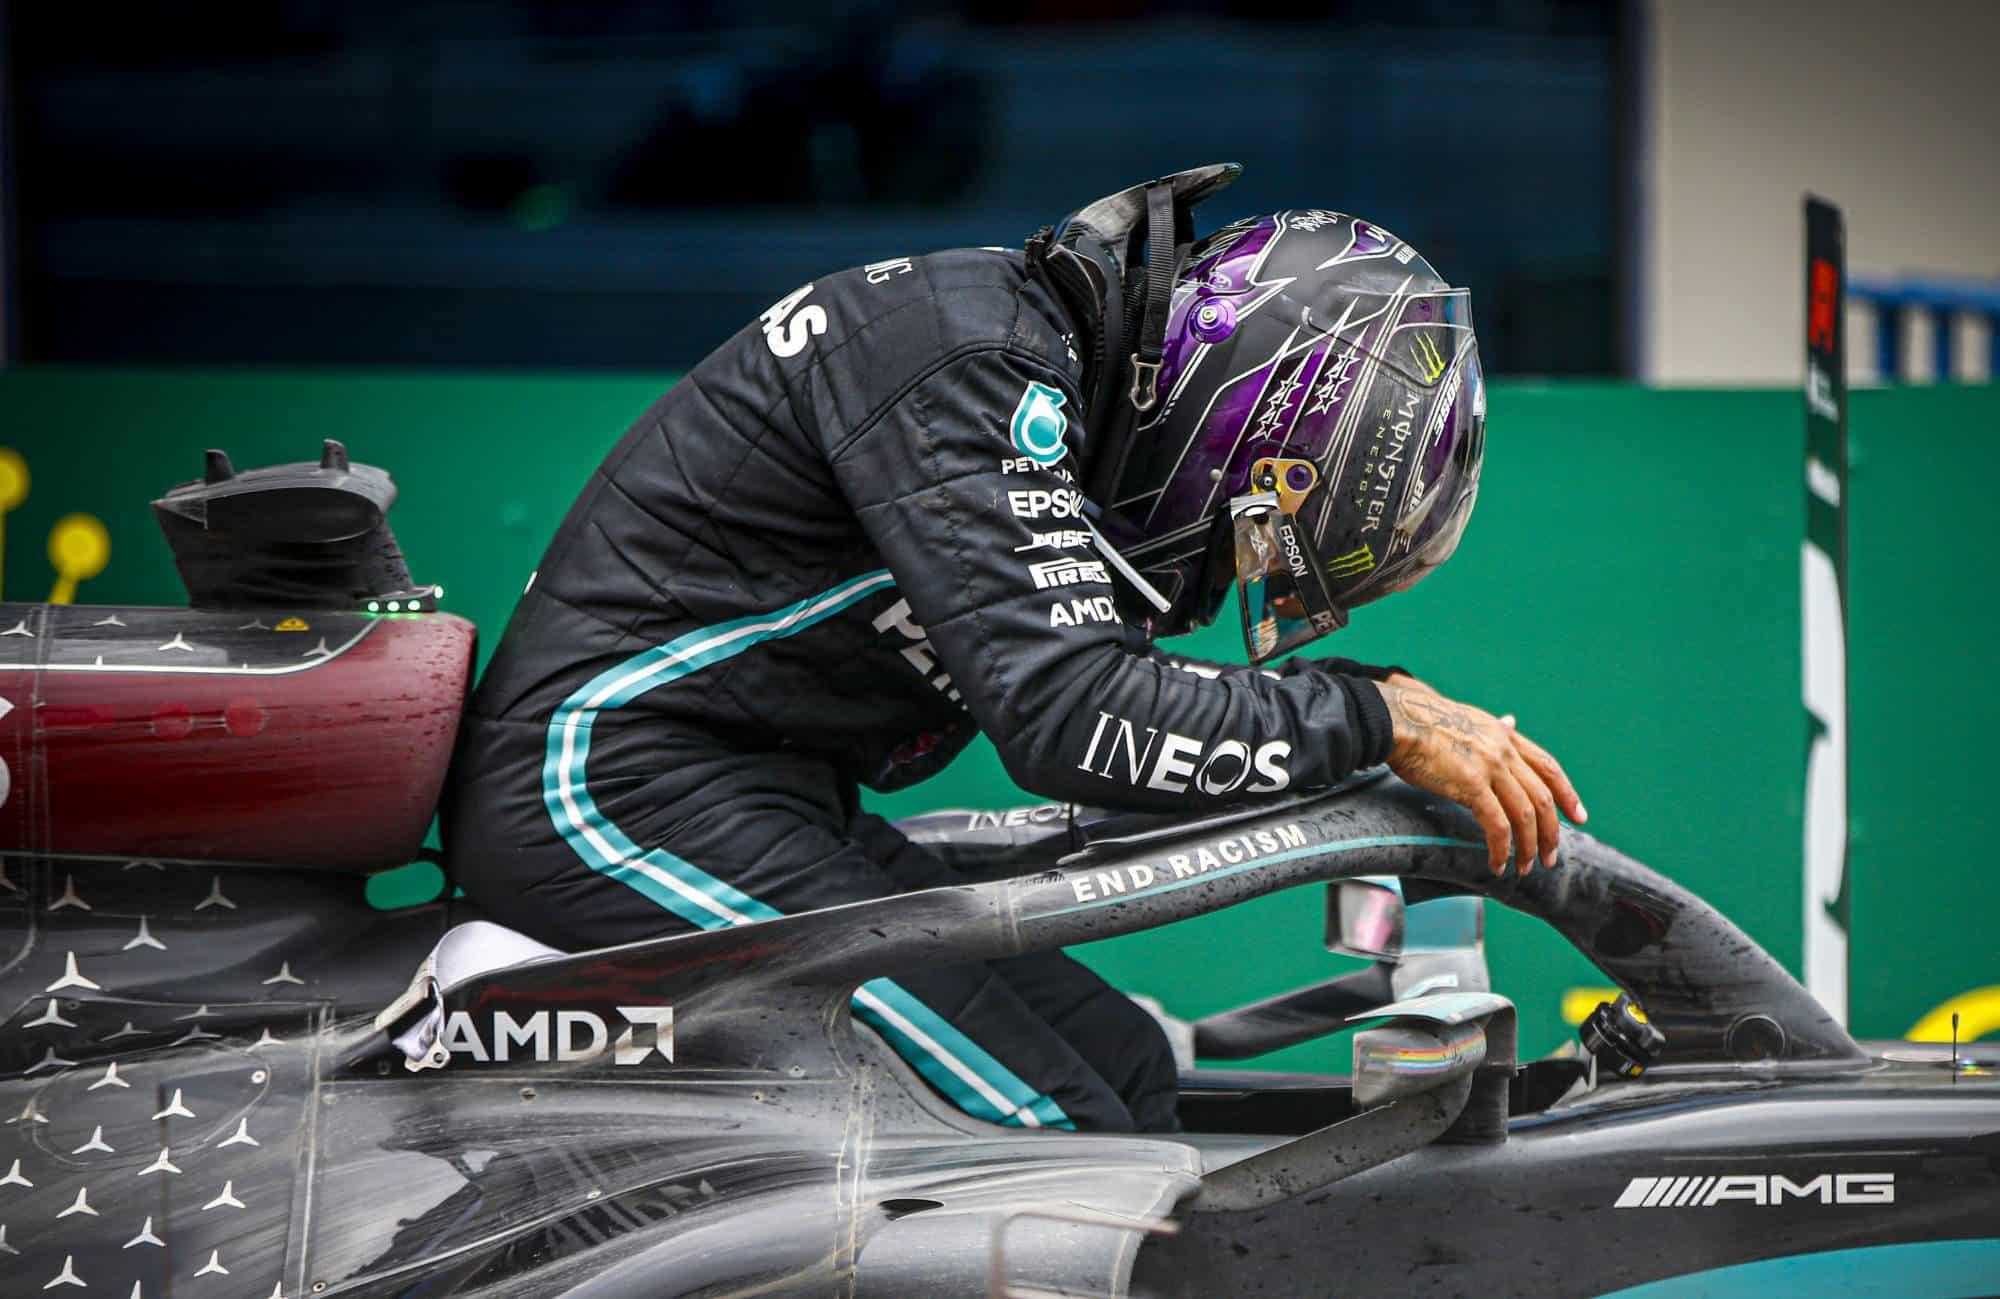 2020 Turkish GP Hamilton after the race 7th title Photo Daimler